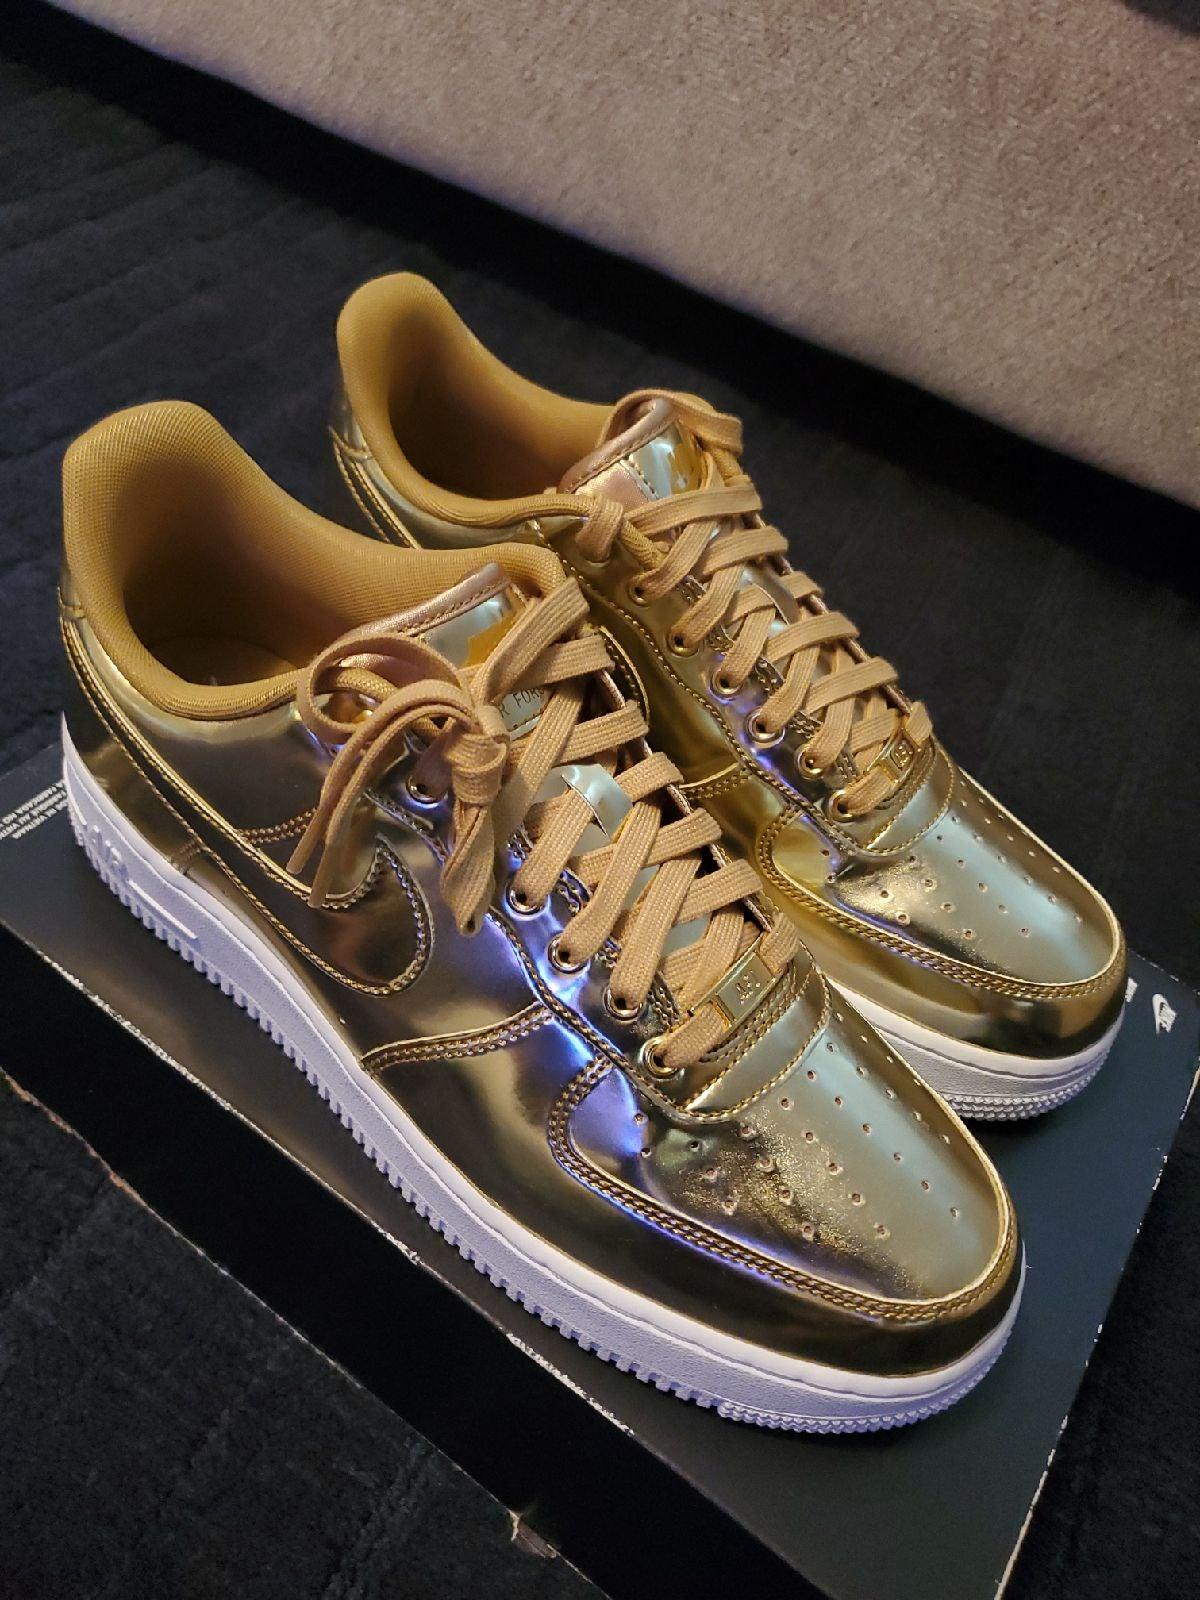 Nike Air Force 1 SP Gold CQ6566-700